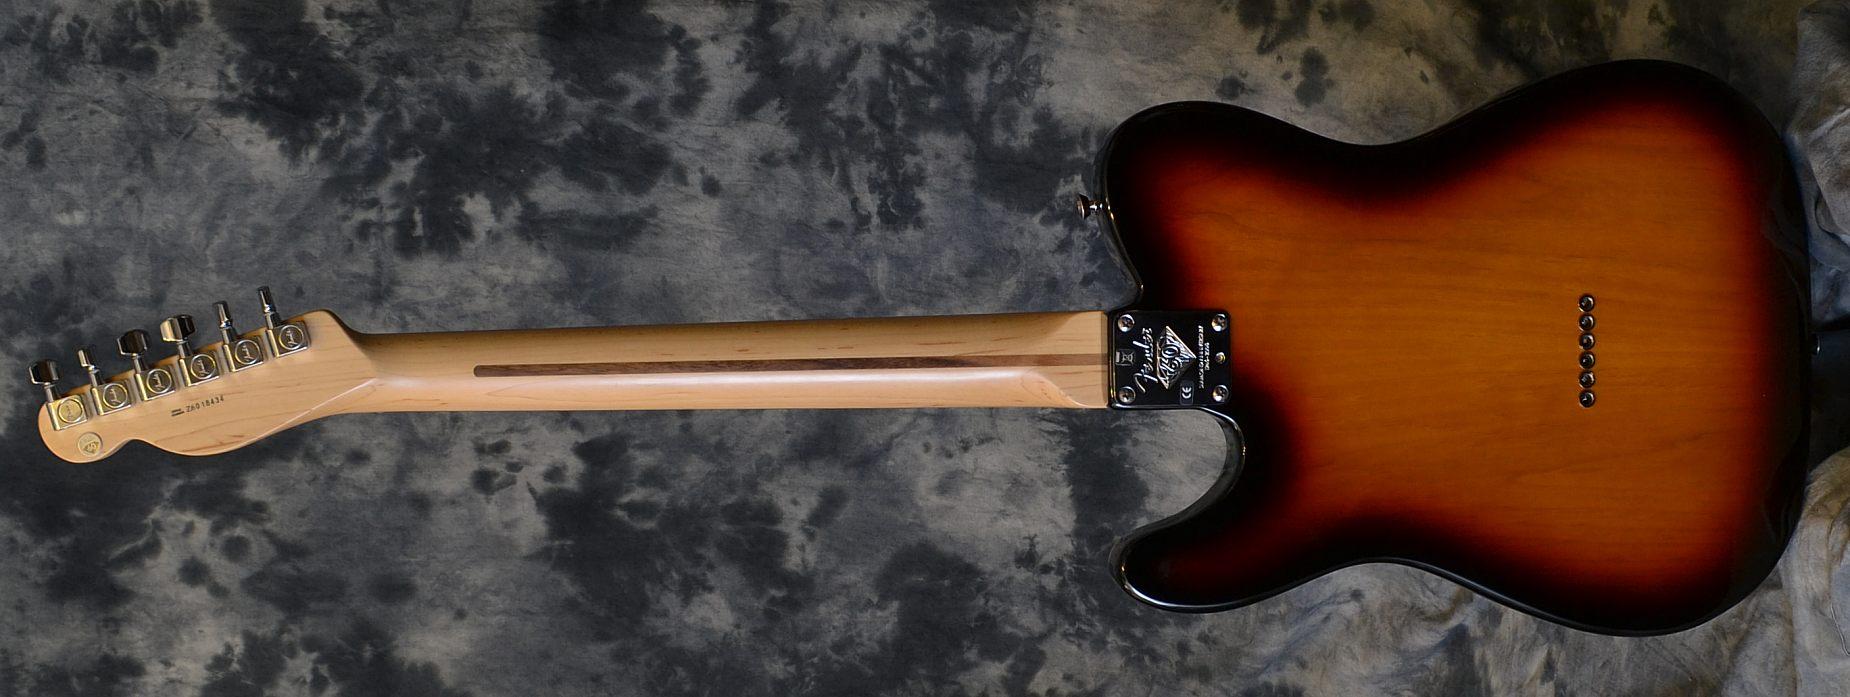 Fender_Tele 60th Ann Modified_2006(C)_back